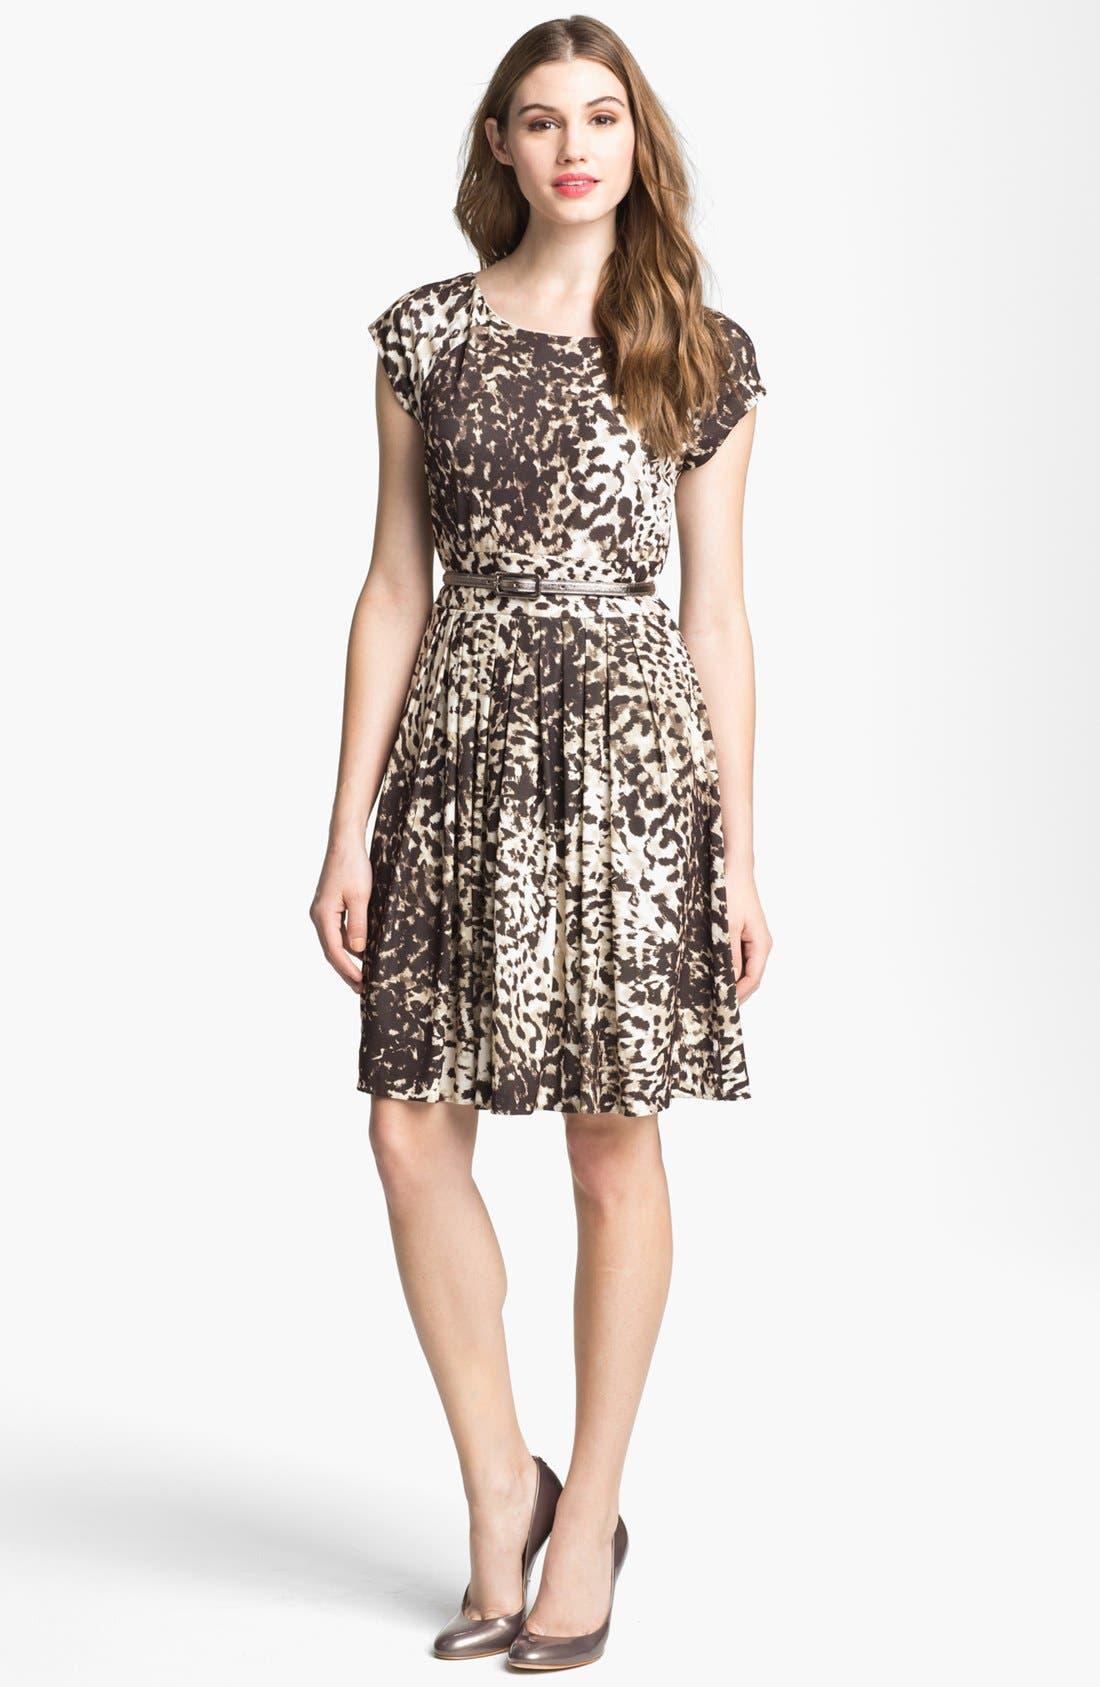 Alternate Image 1 Selected - Eliza J Print Jersey Fit & Flare Dress (Online Only)